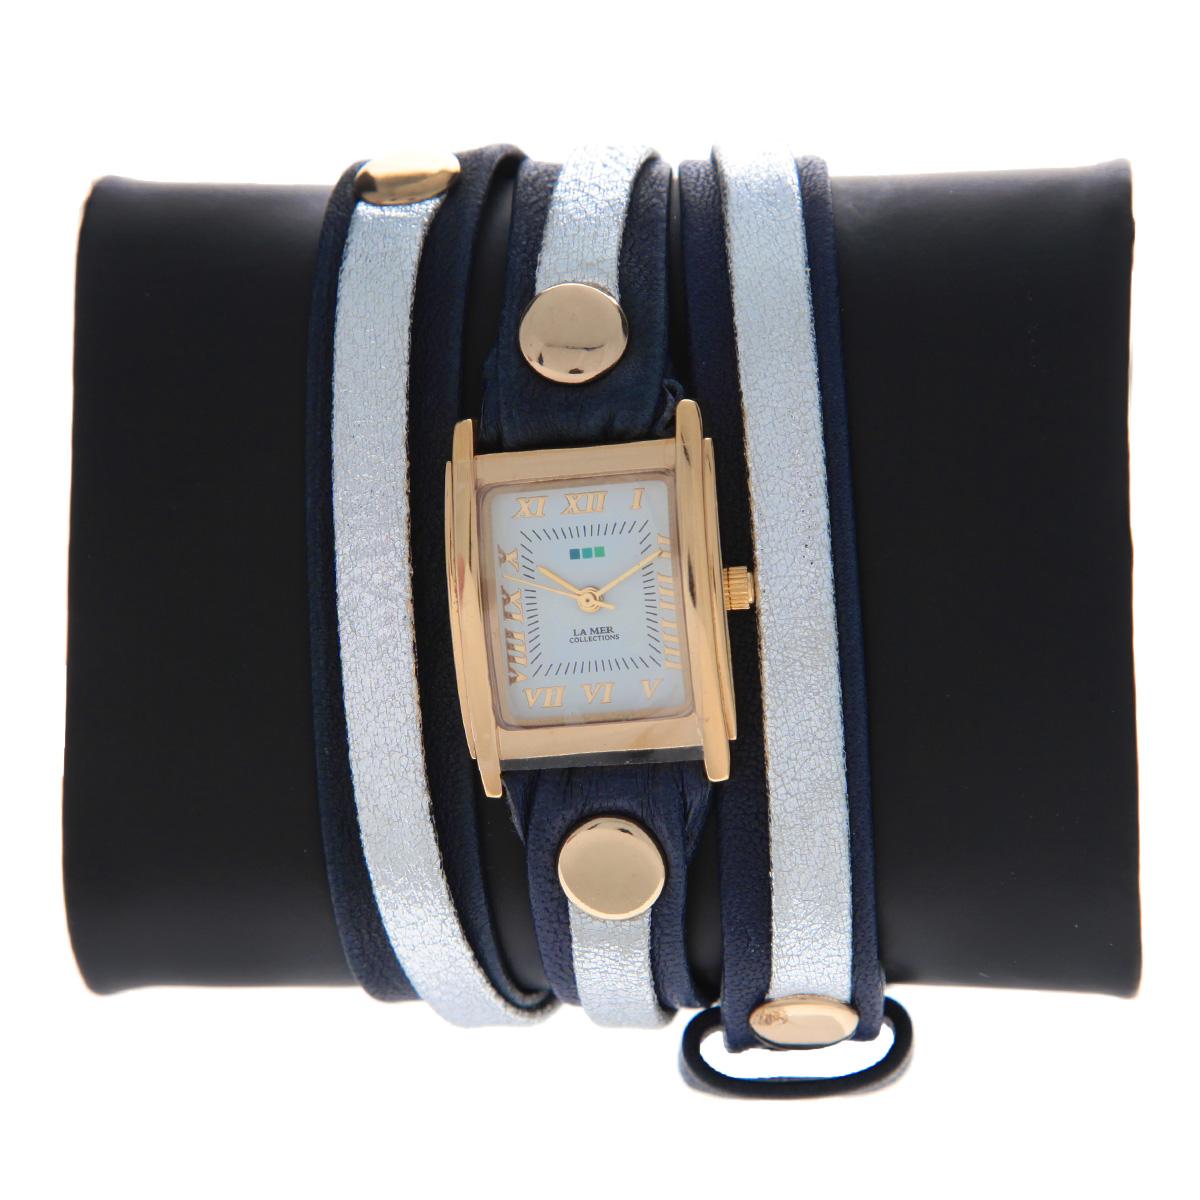 "Часы наручные женские La Mer Collections ""Simple Layer Navy -Metallic"". LMLW3003x ( LMLW3003x )"